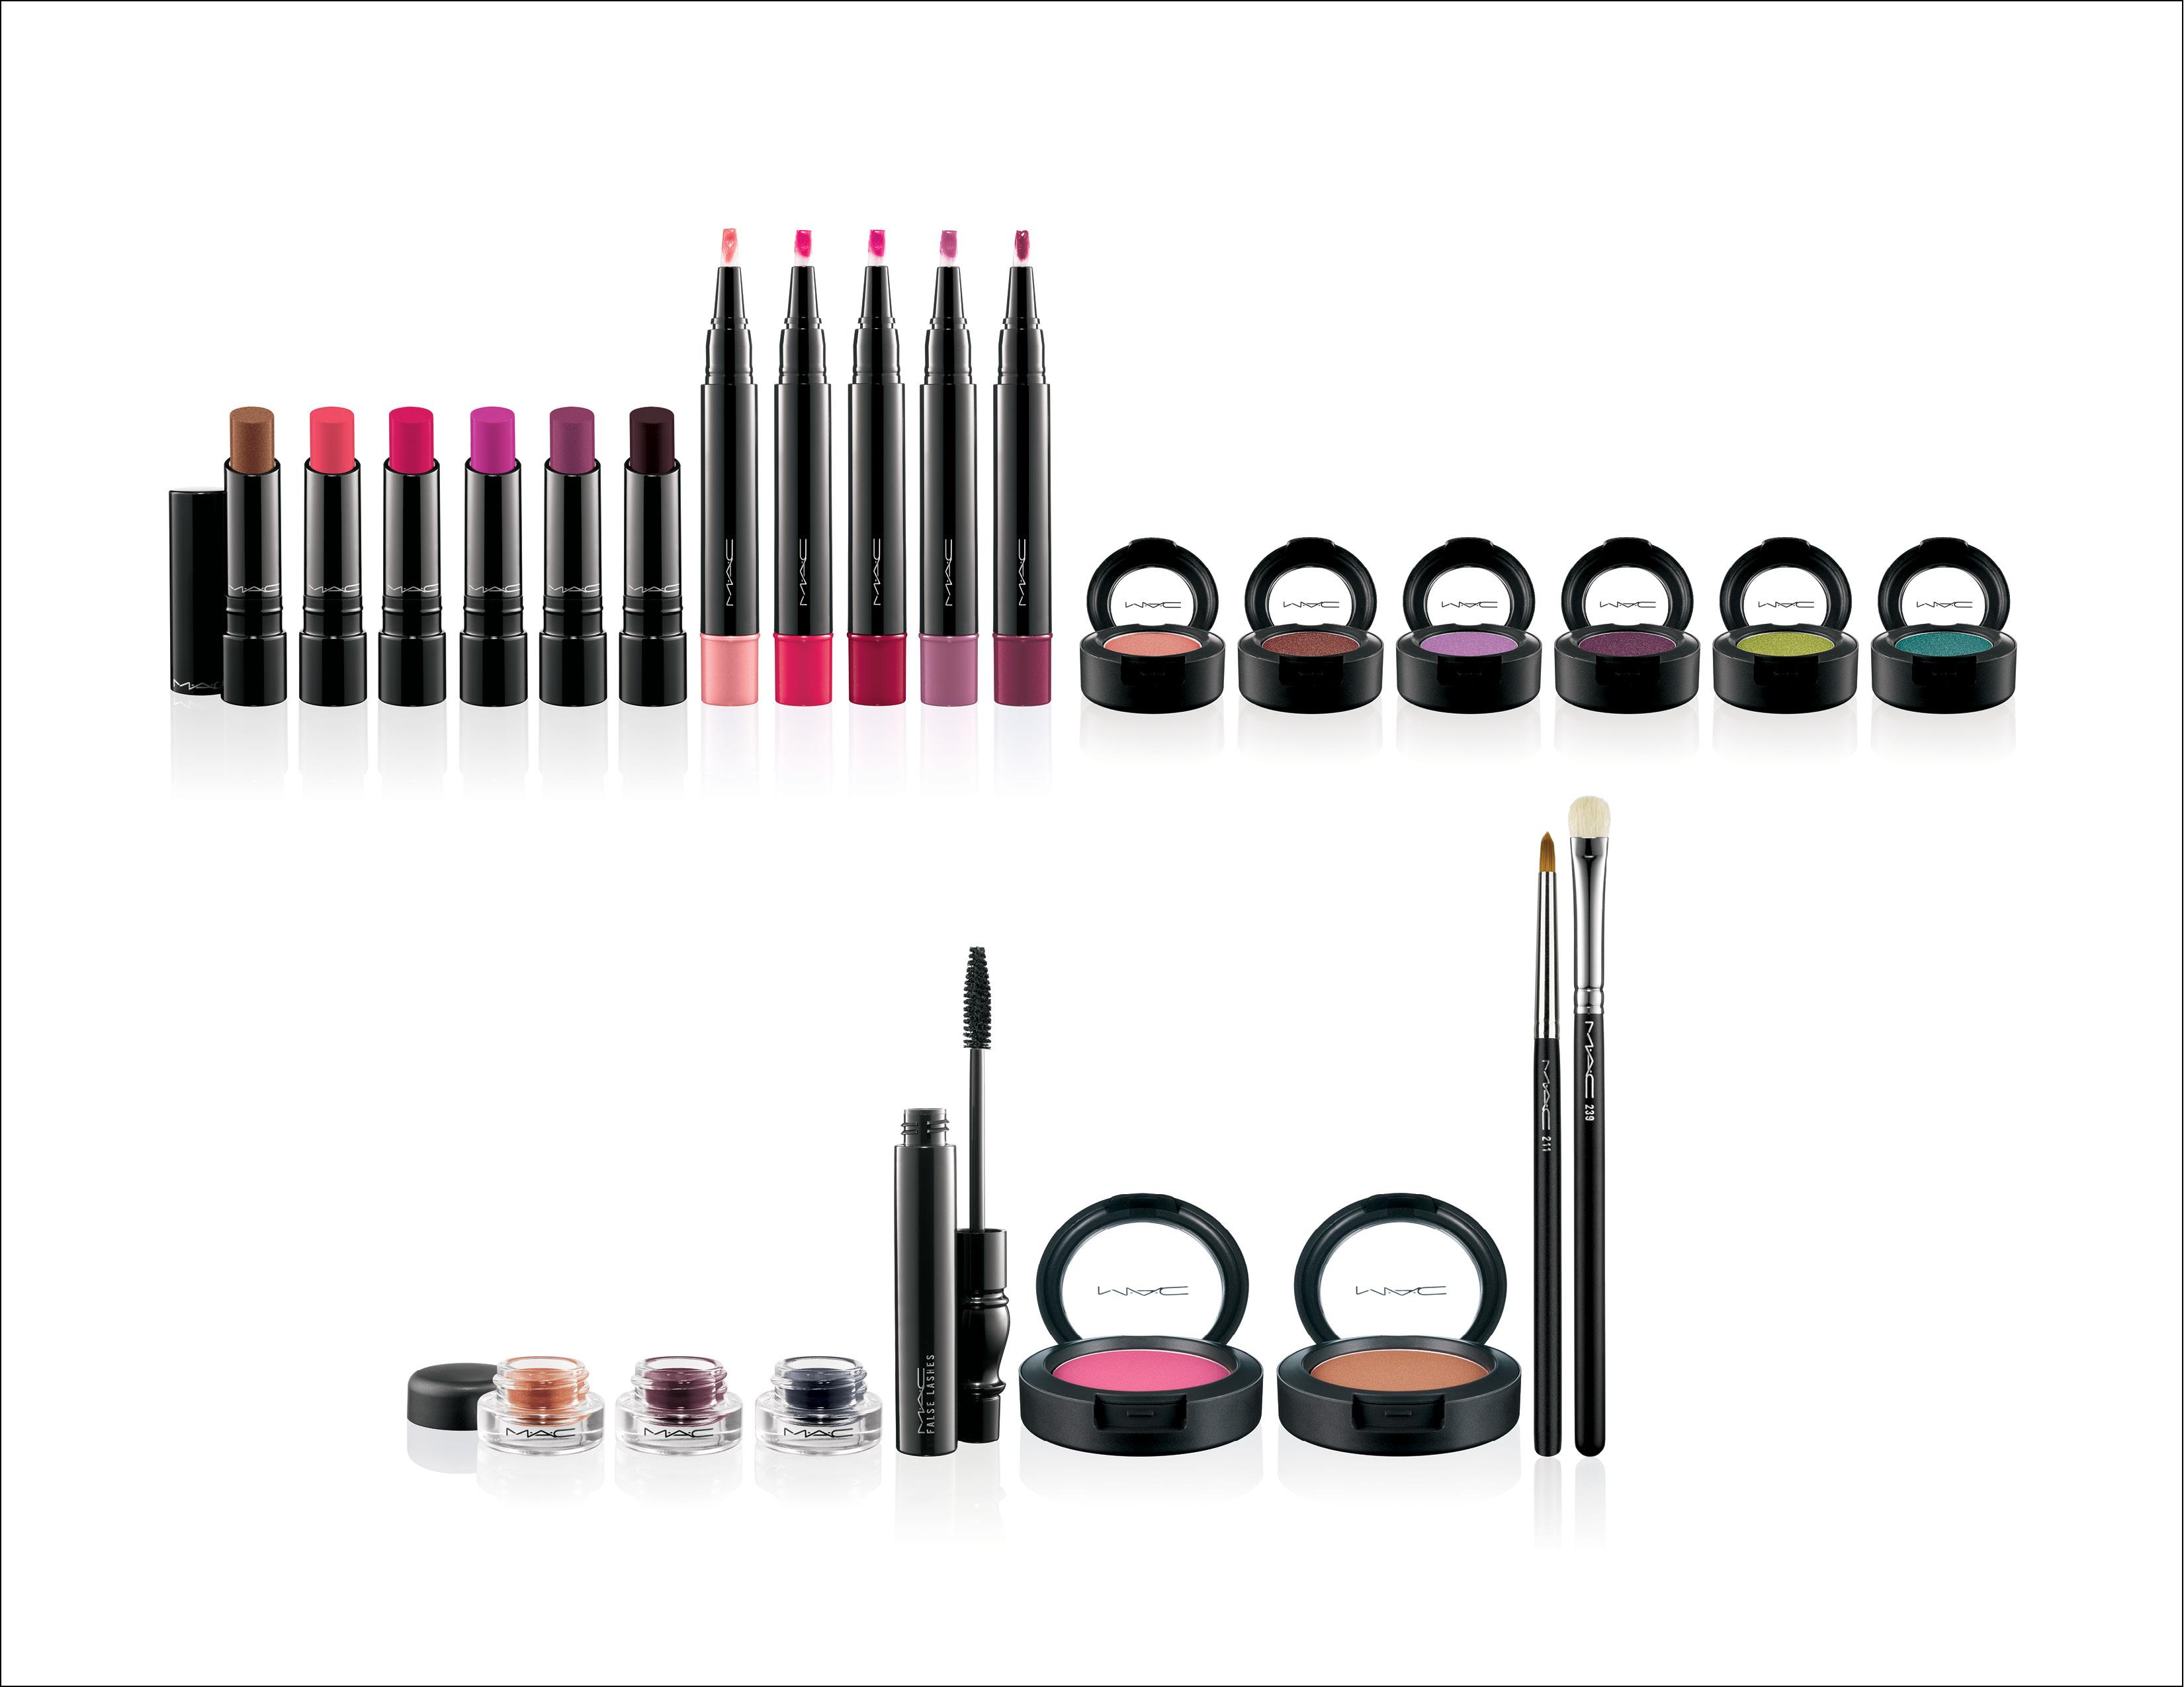 MAC MoodyBlooms Fluidline Lineup Global slika 16 MAC Cosmetics: Nova kolekcija Moody Blooms